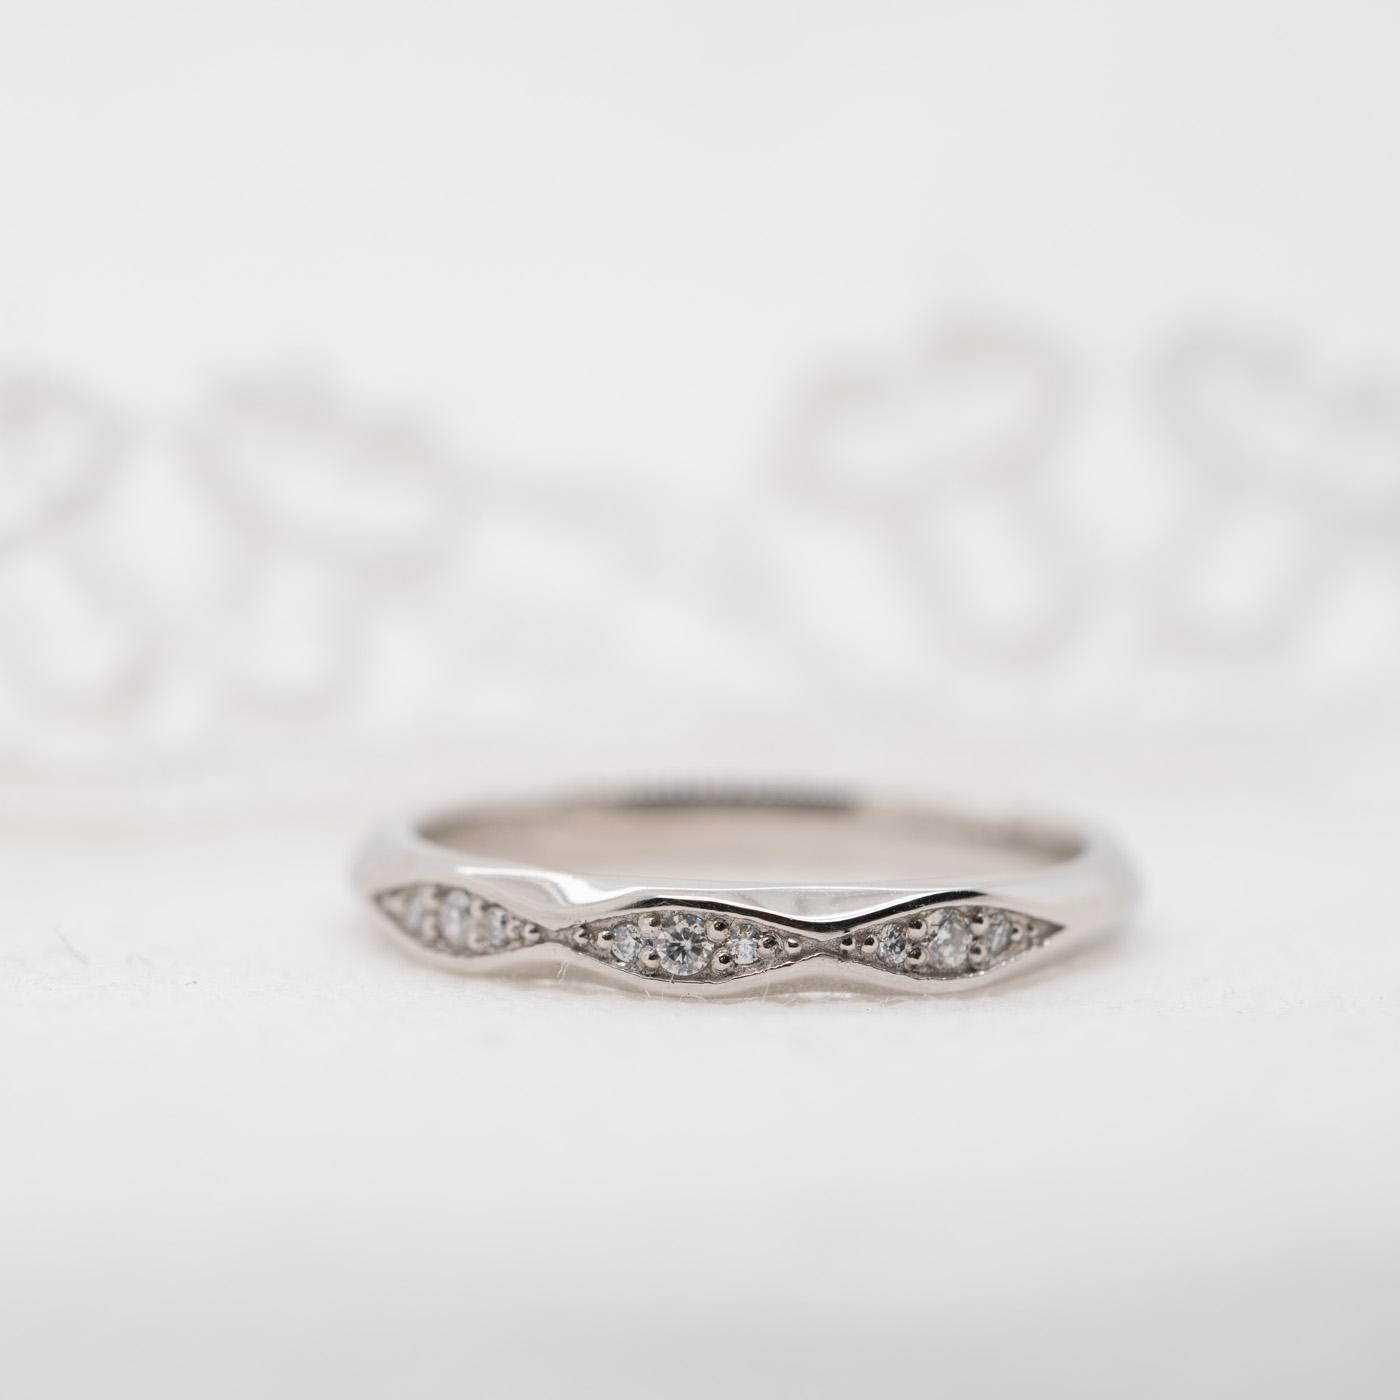 Lab Created Diamond Wedding Band | Celia | Ethica Diamonds Cornwall